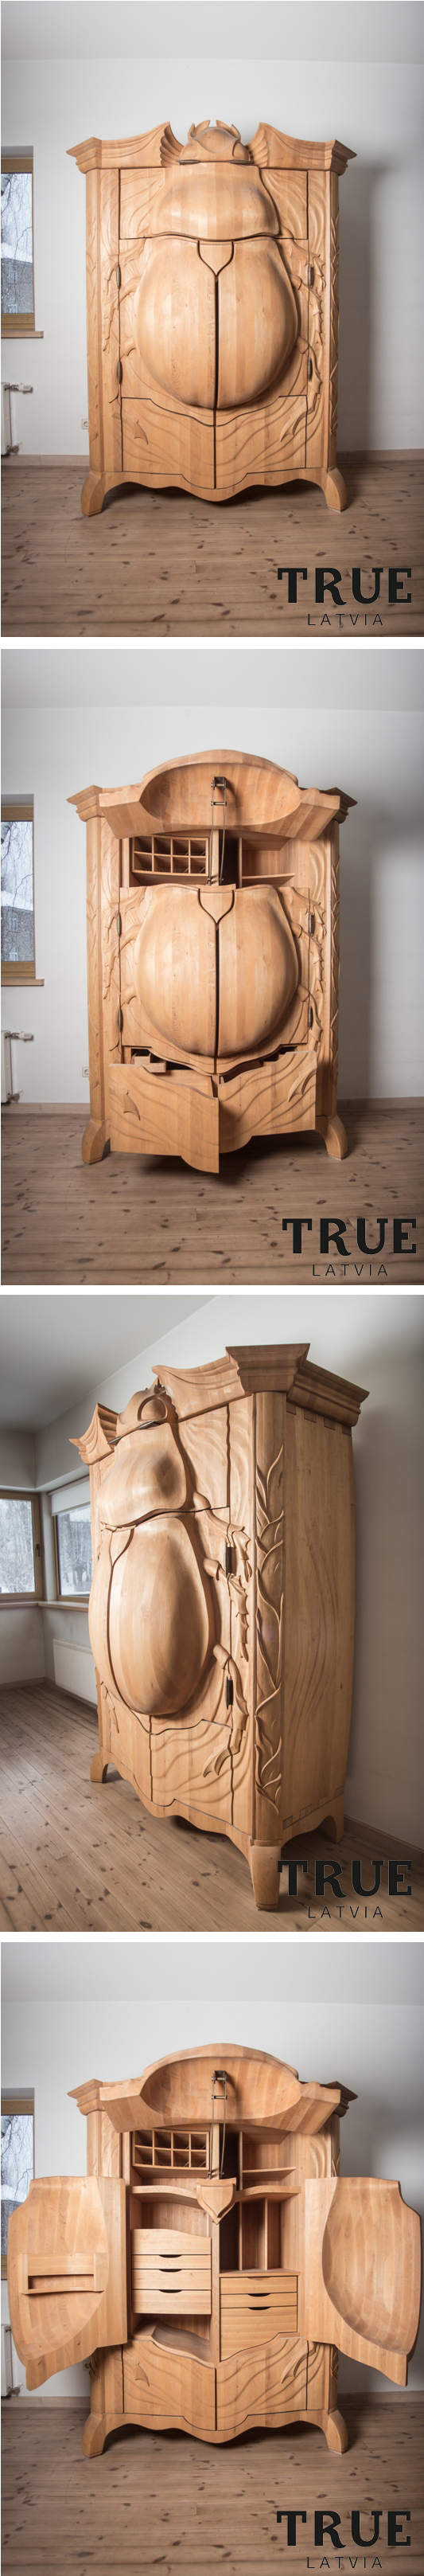 BUG by Latvian designer Janis Straupe. Furniture, closet. PURCHASE on TRUE LATVIA shop http://www.truelatvia.com